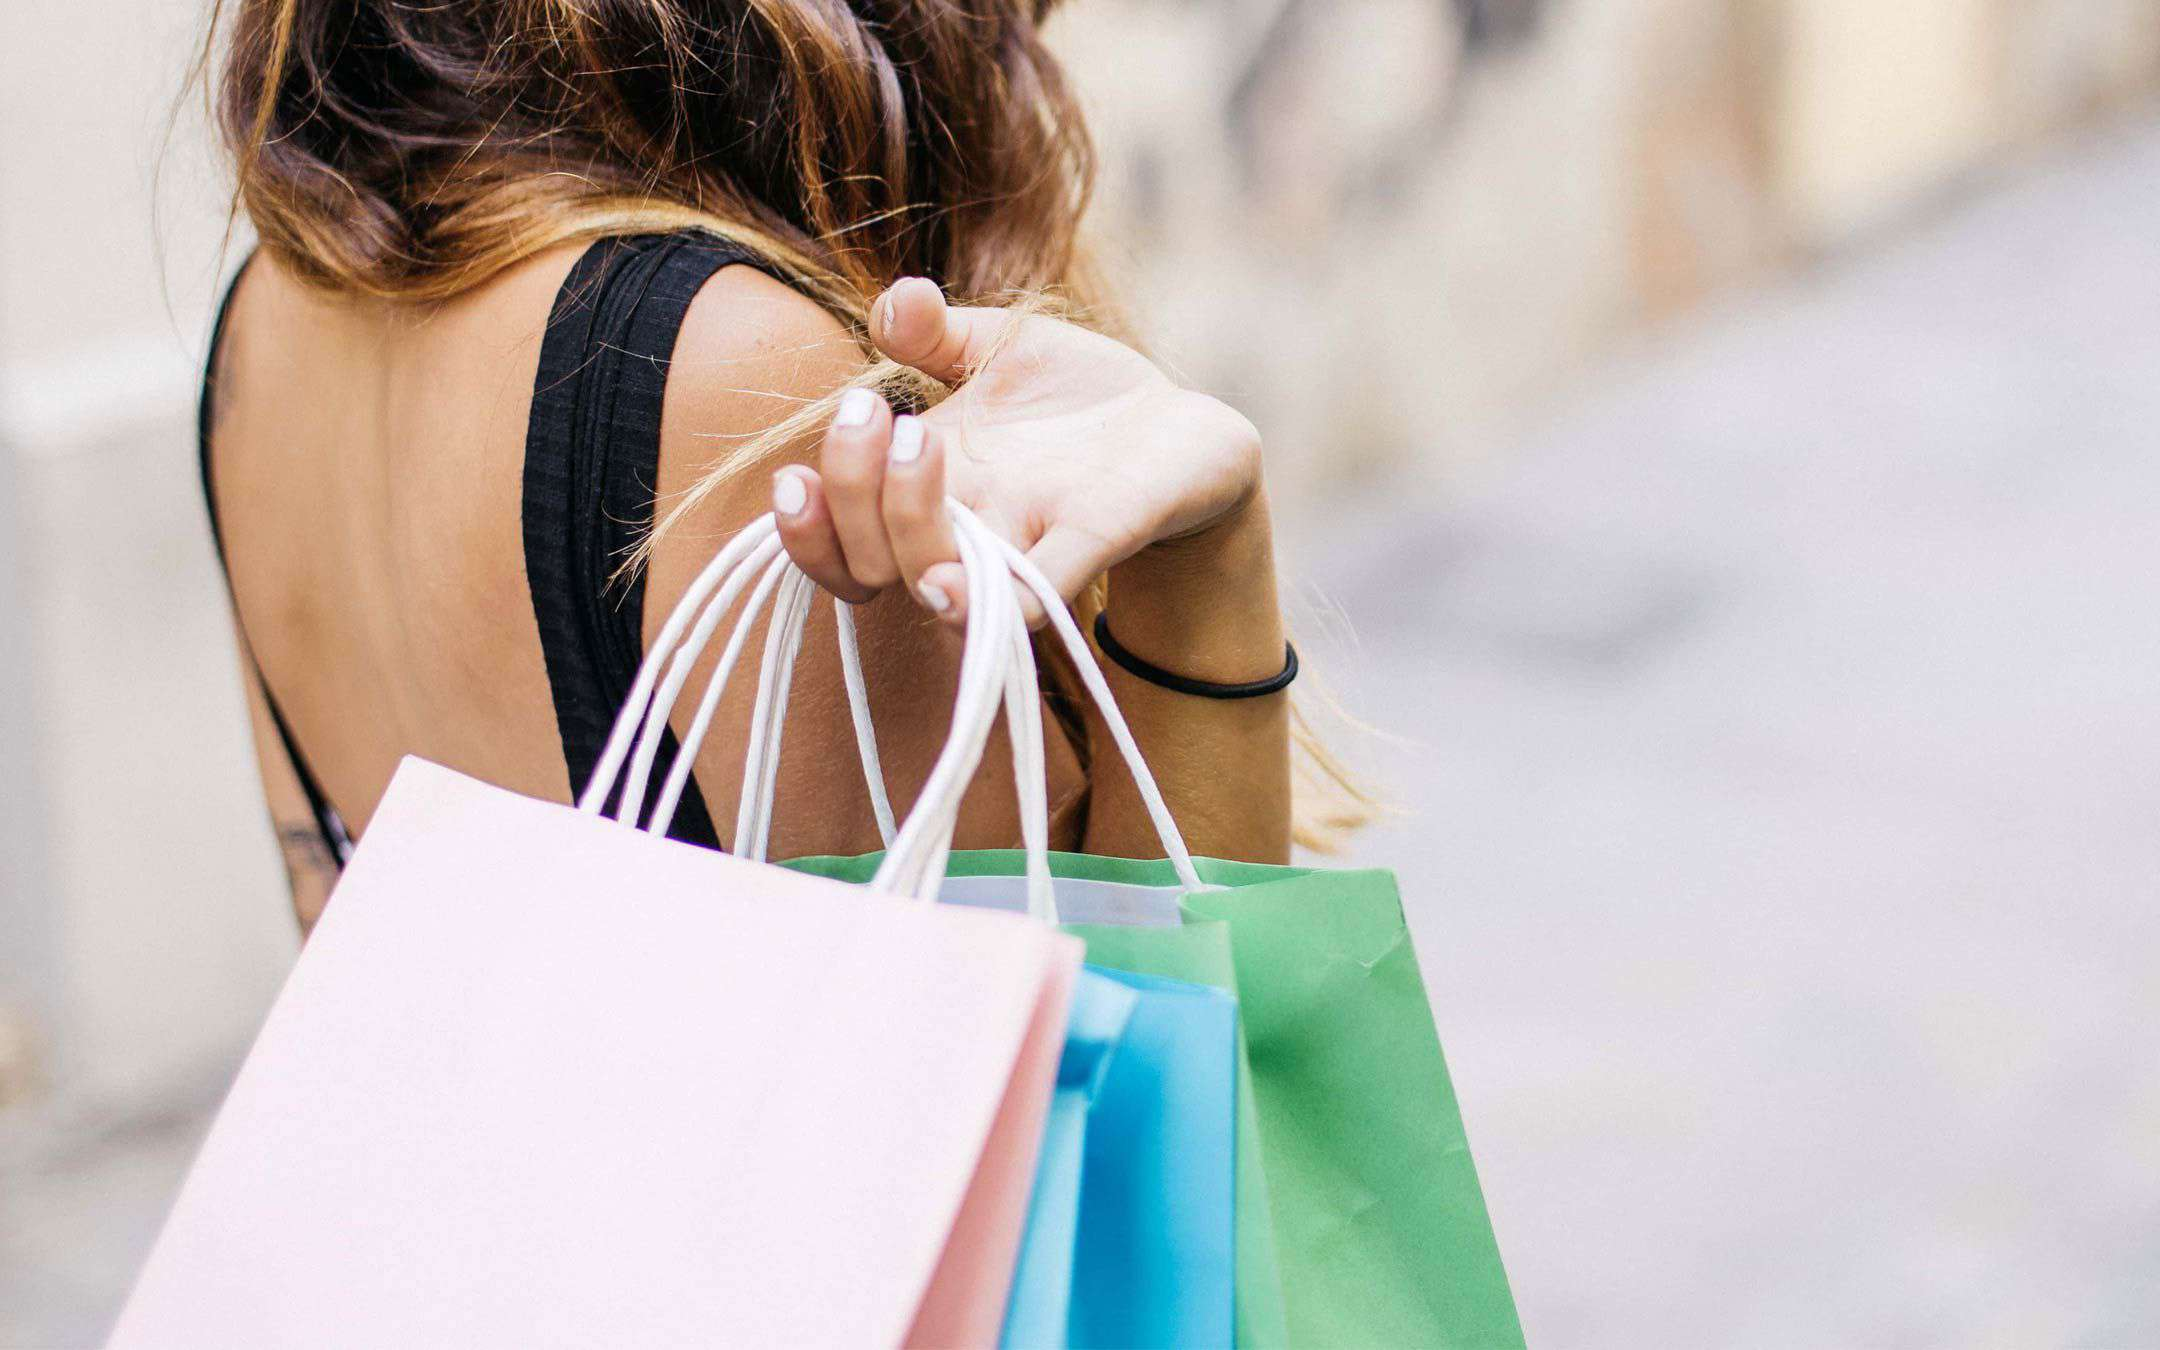 Offline cashback or online discounts? Shopping at the start